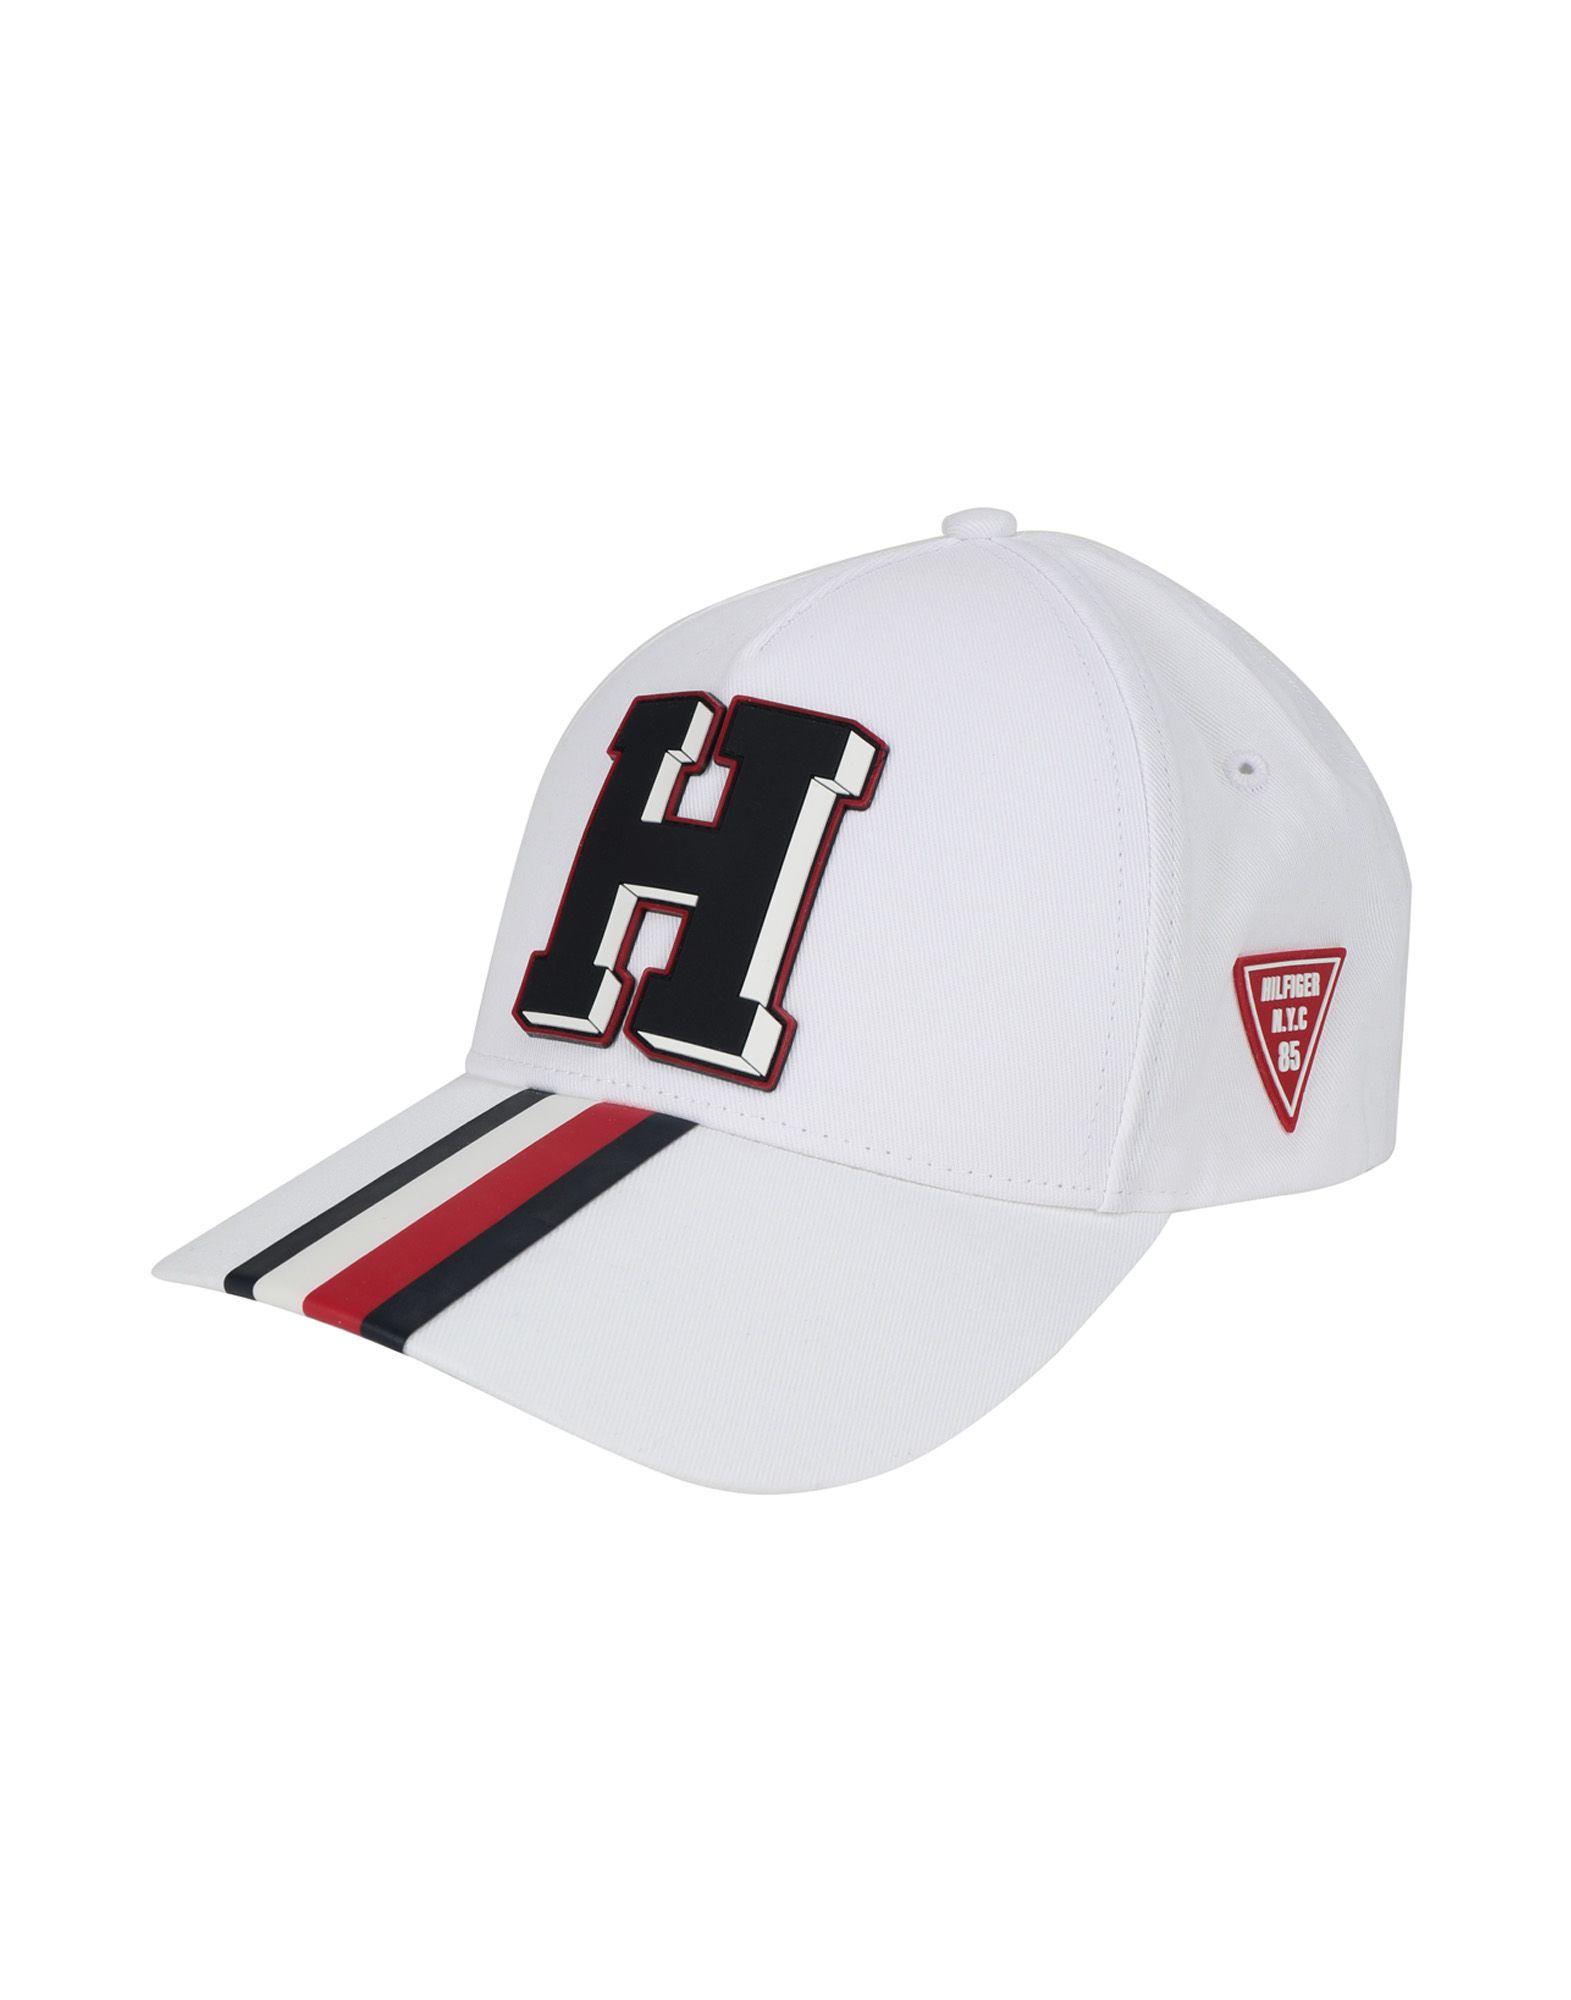 82c4d1a31256c1 Tommy Hilfiger H Cap - Hat - Men Tommy Hilfiger Hats online on YOOX ...